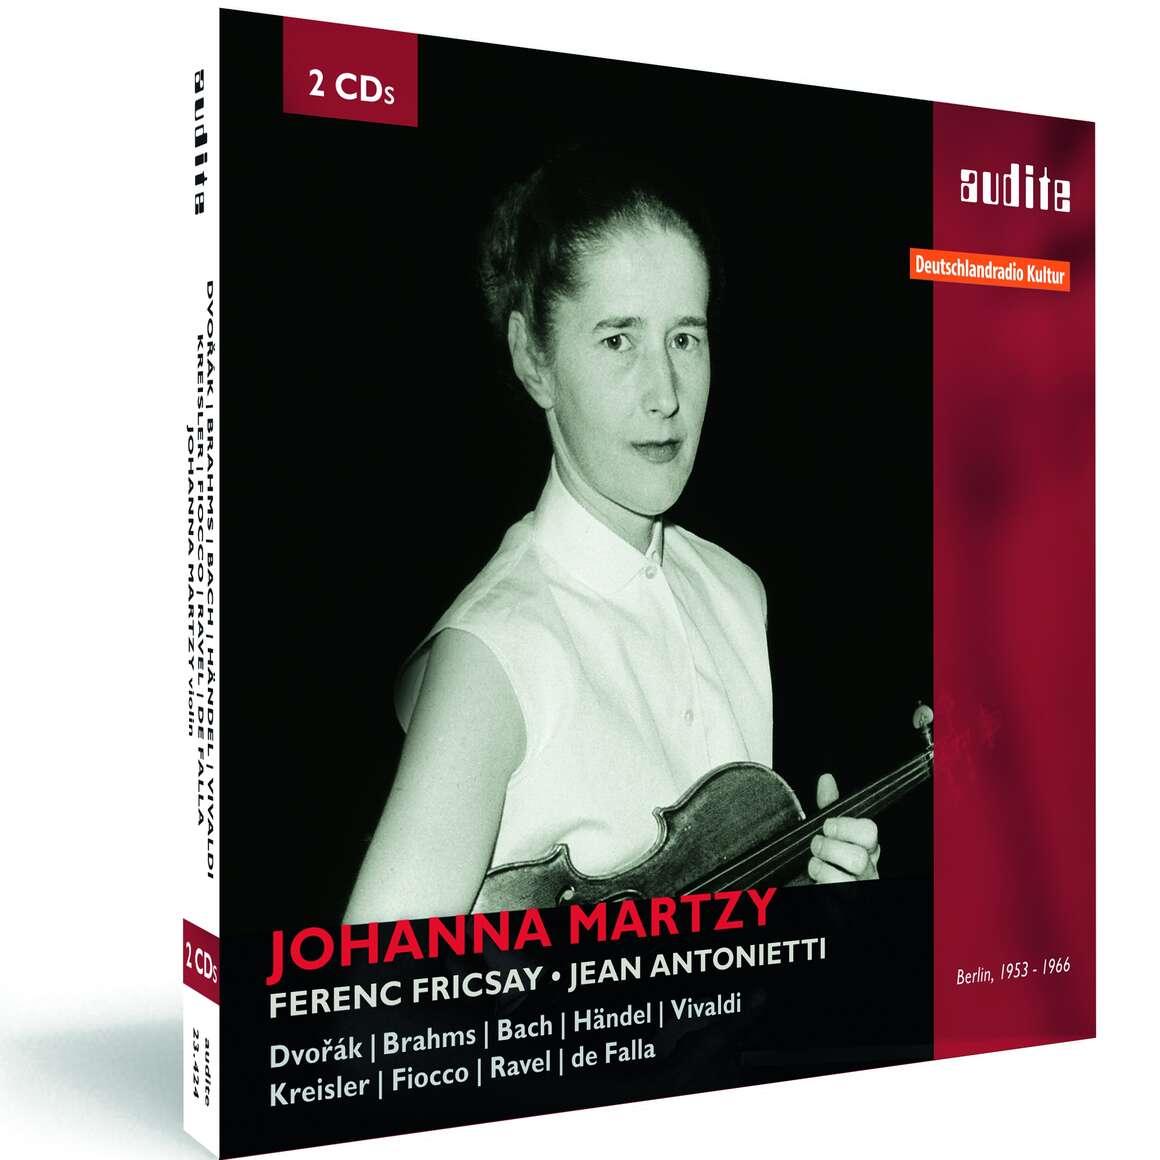 Portrait Johanna Martzy